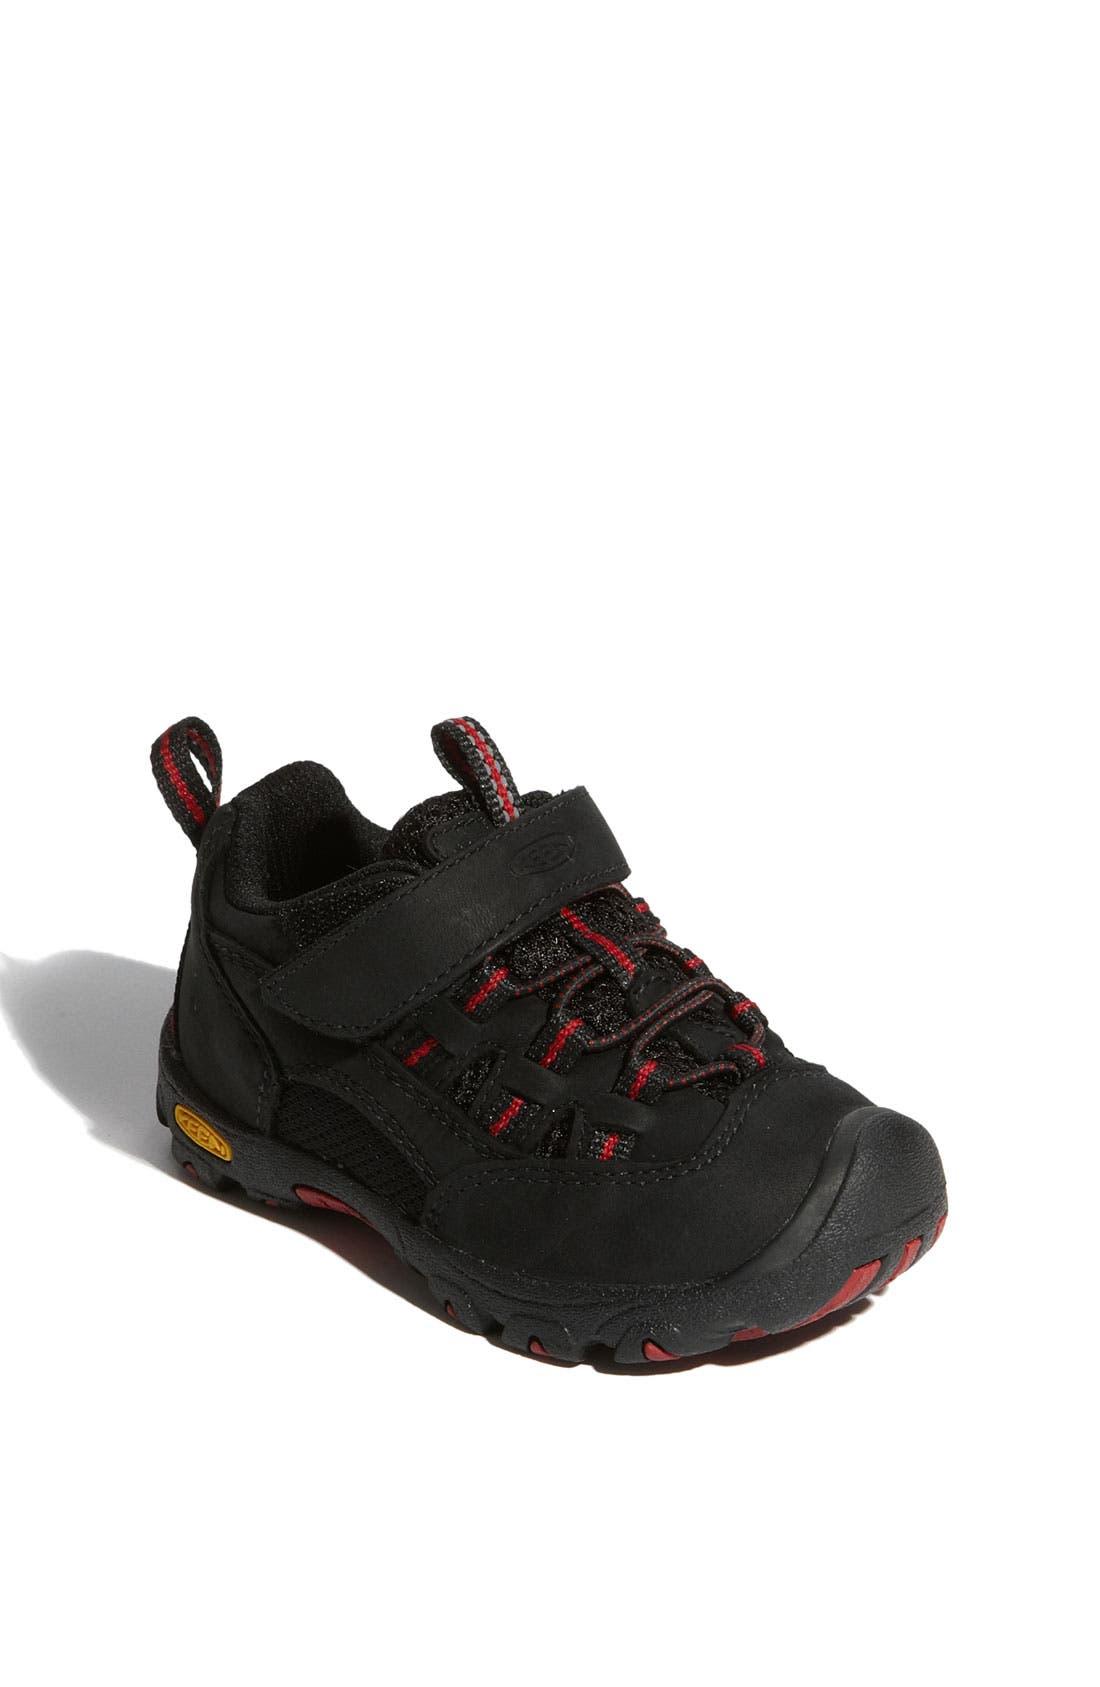 Main Image - Keen 'Alamosa' Sneaker (Baby & Walker)